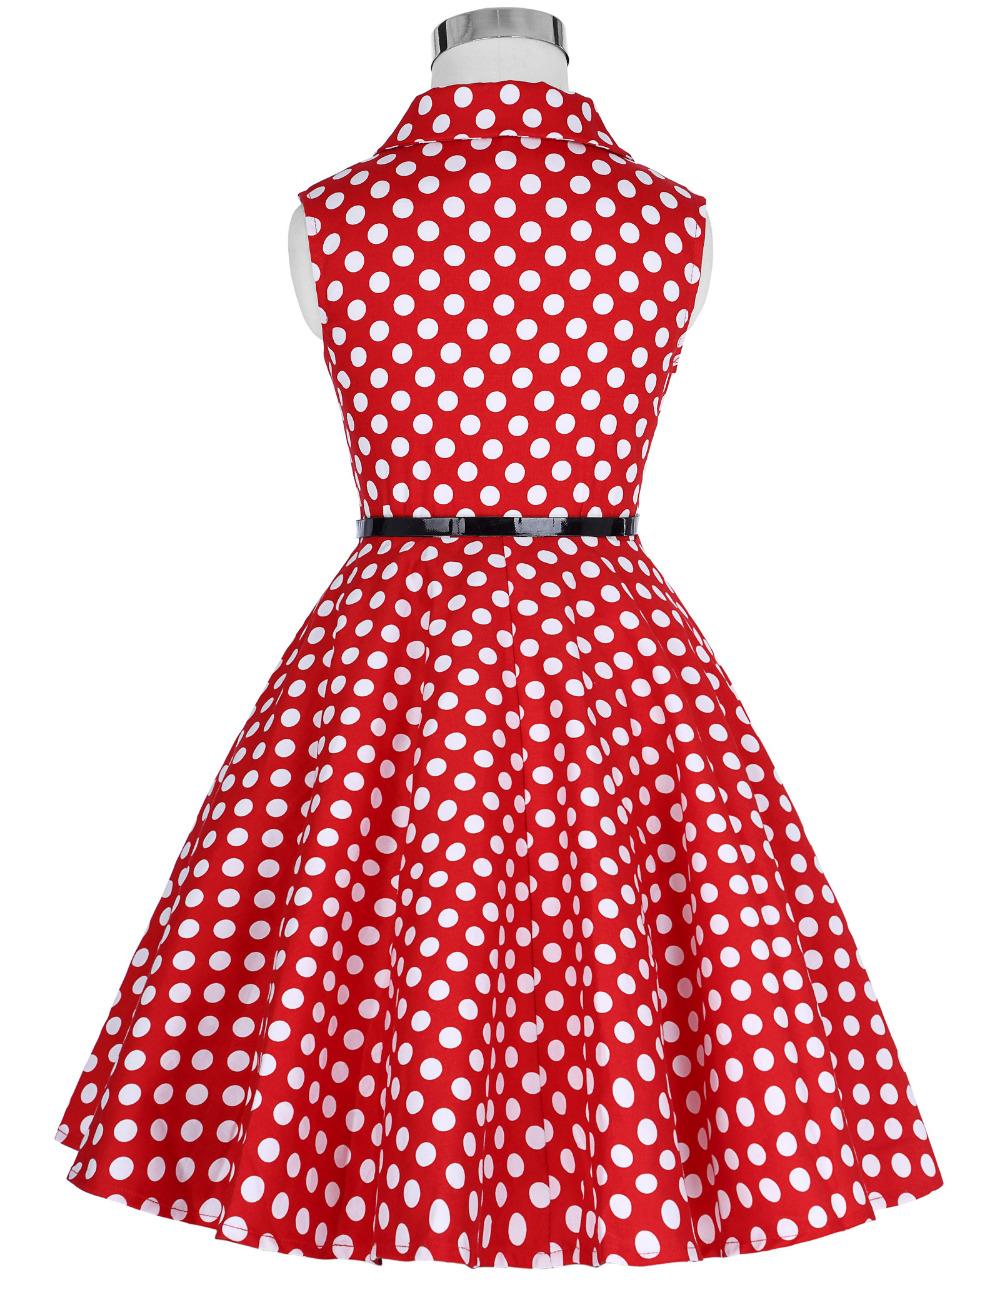 Grace Karin Flower Girl Dresses for Weddings 2017 Sleeveless Polka Dots Printed Vintage Pin Up Style Children's Clothing 18